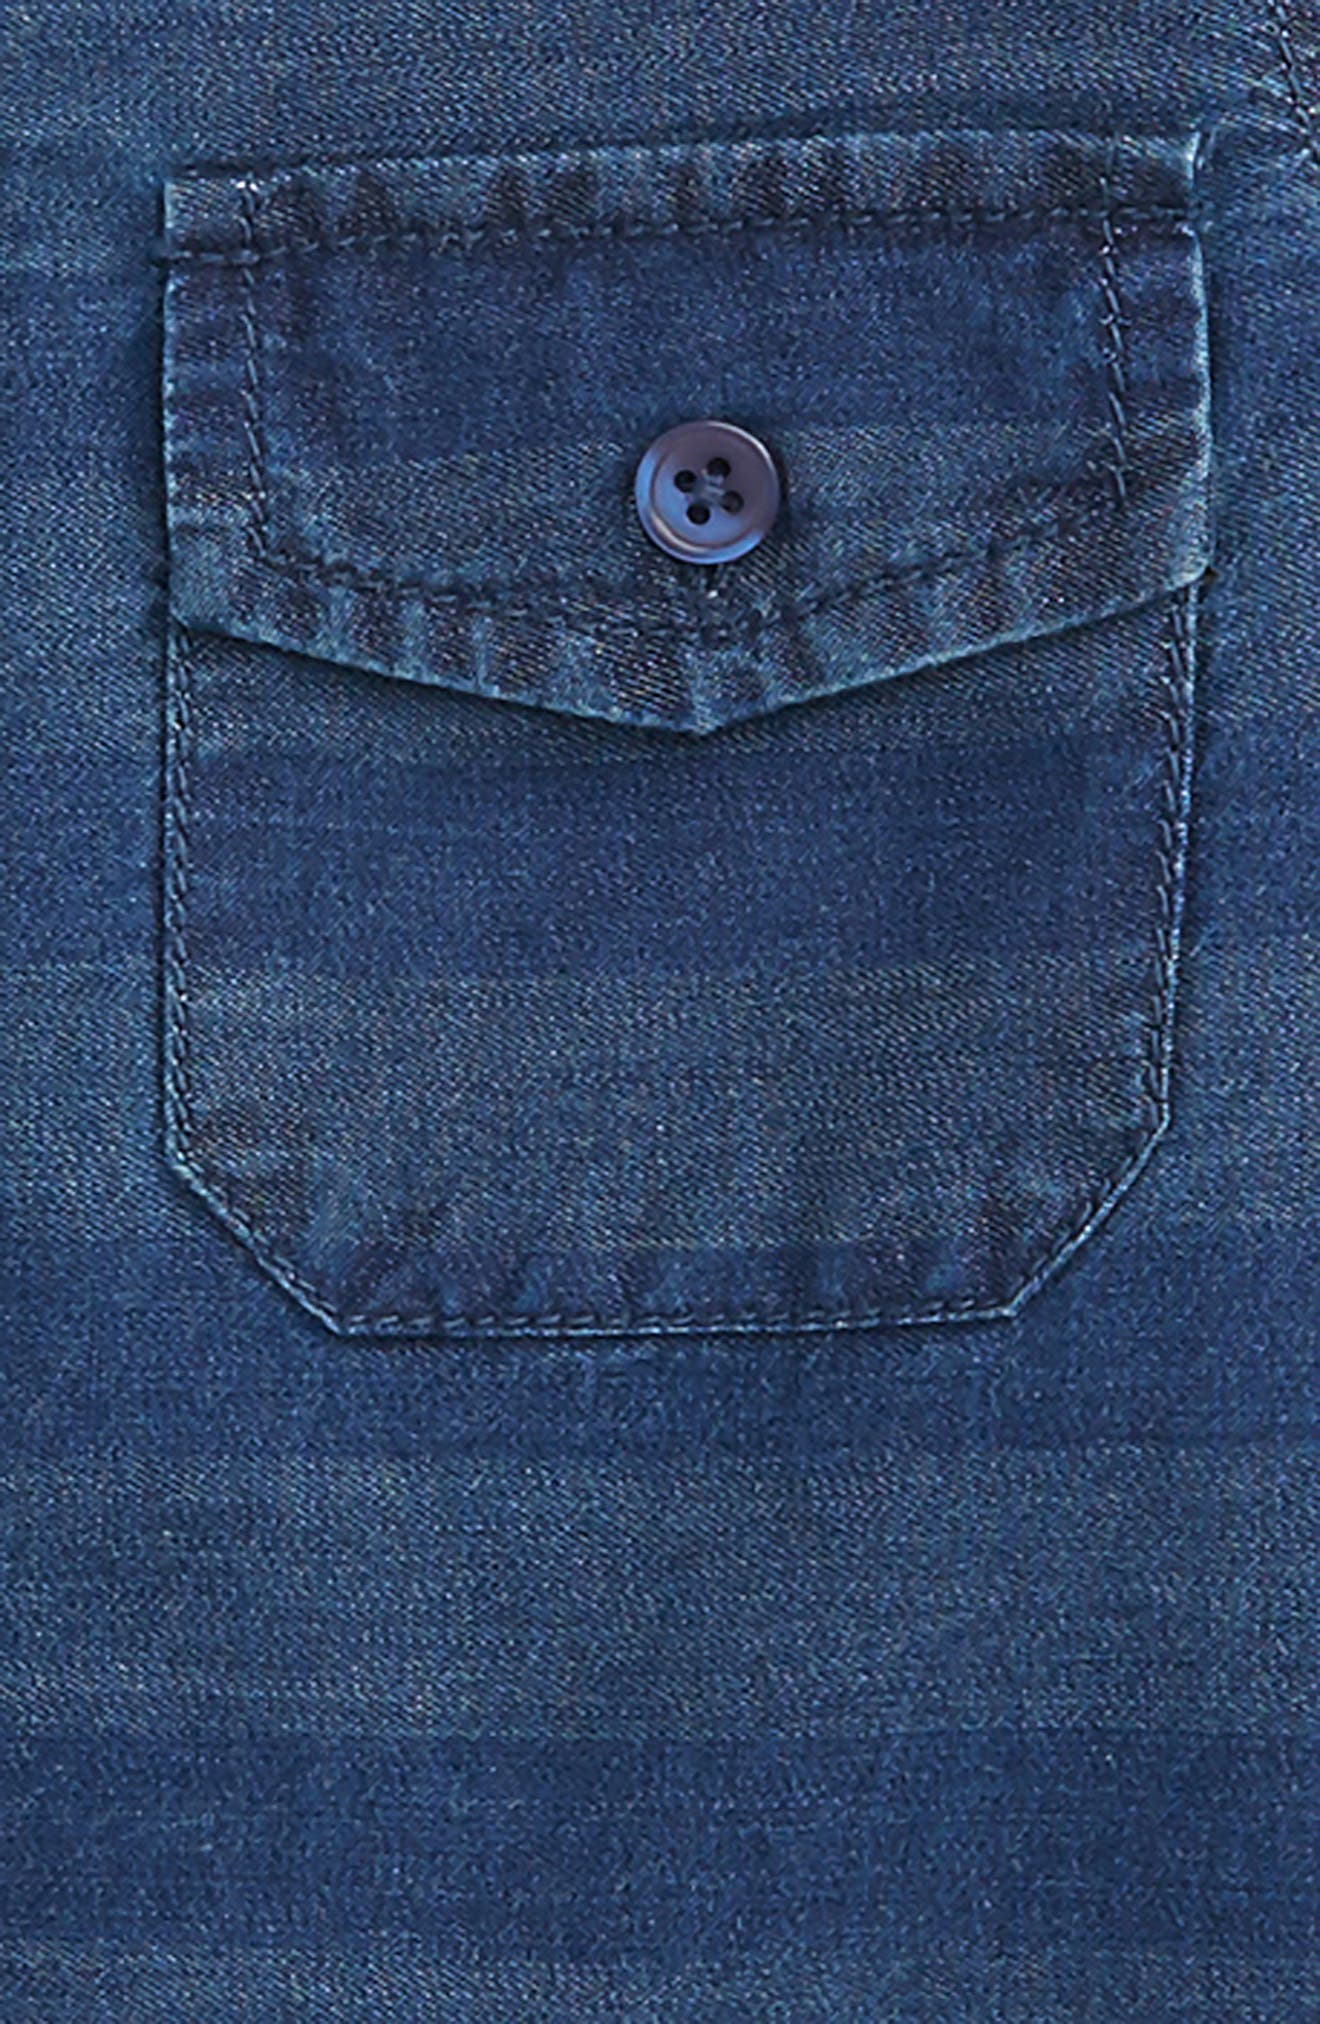 Aiden Stripe Chambray Shirt,                             Alternate thumbnail 2, color,                             Indigo